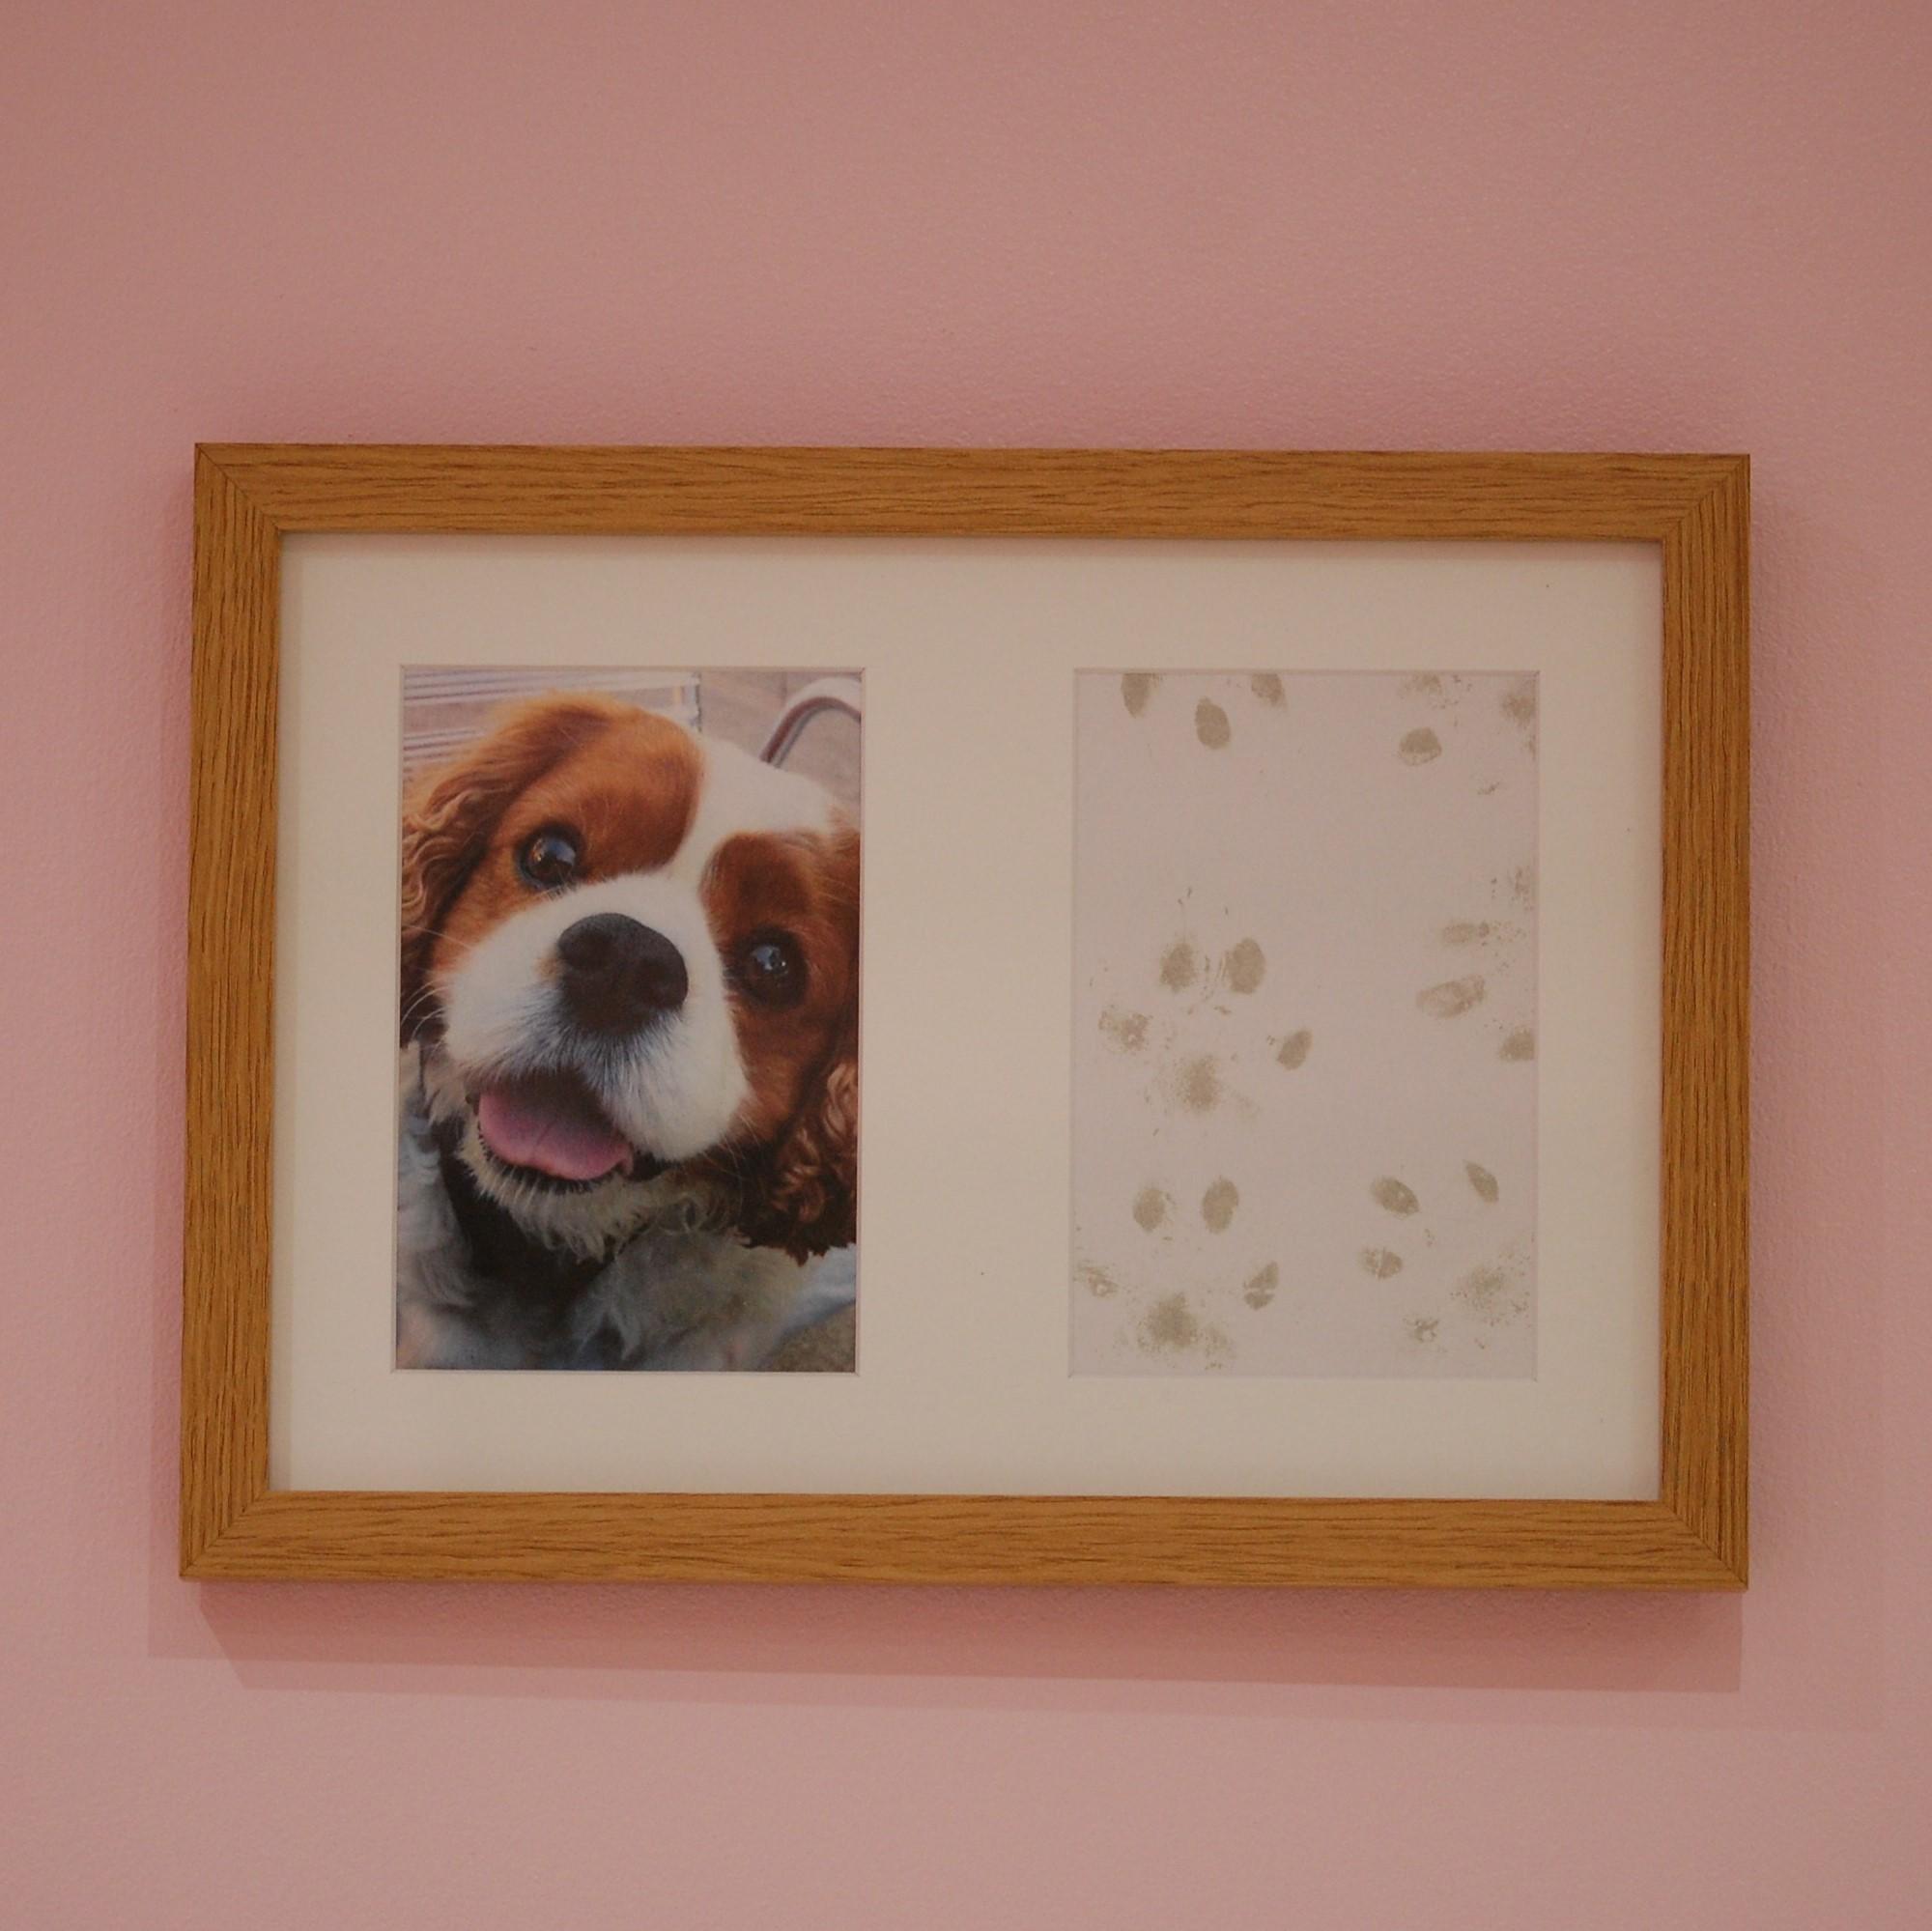 French oak effect frame with dog paw print and photo keepsake